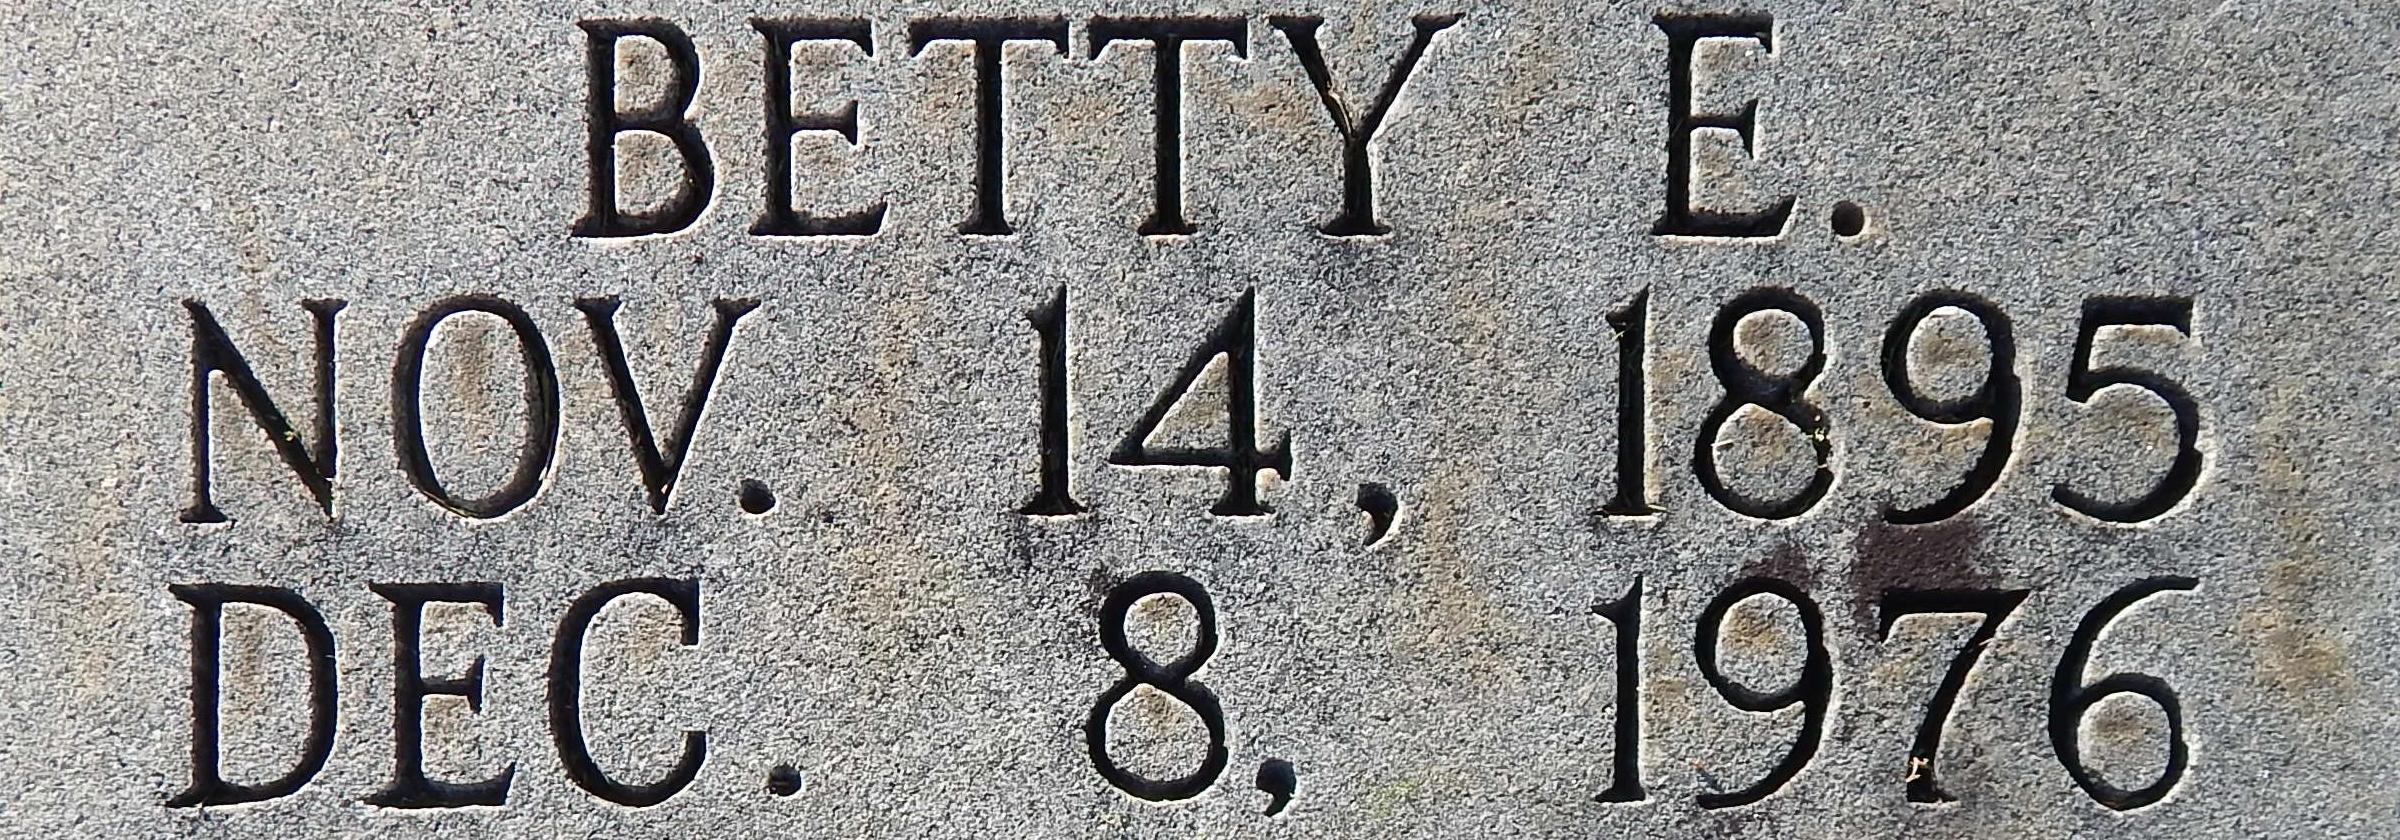 Betty E. Blanks